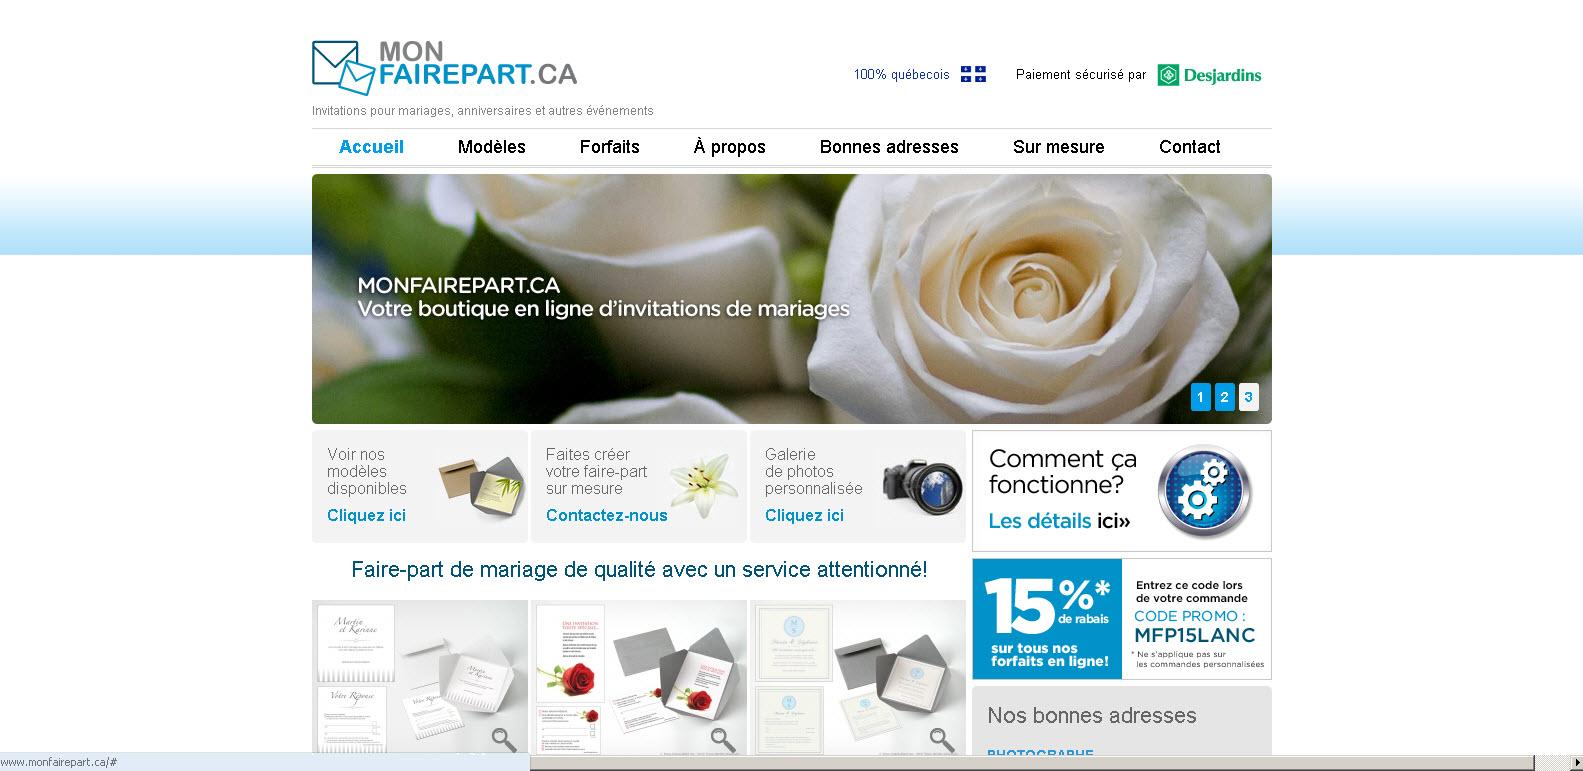 Monfairepart.ca